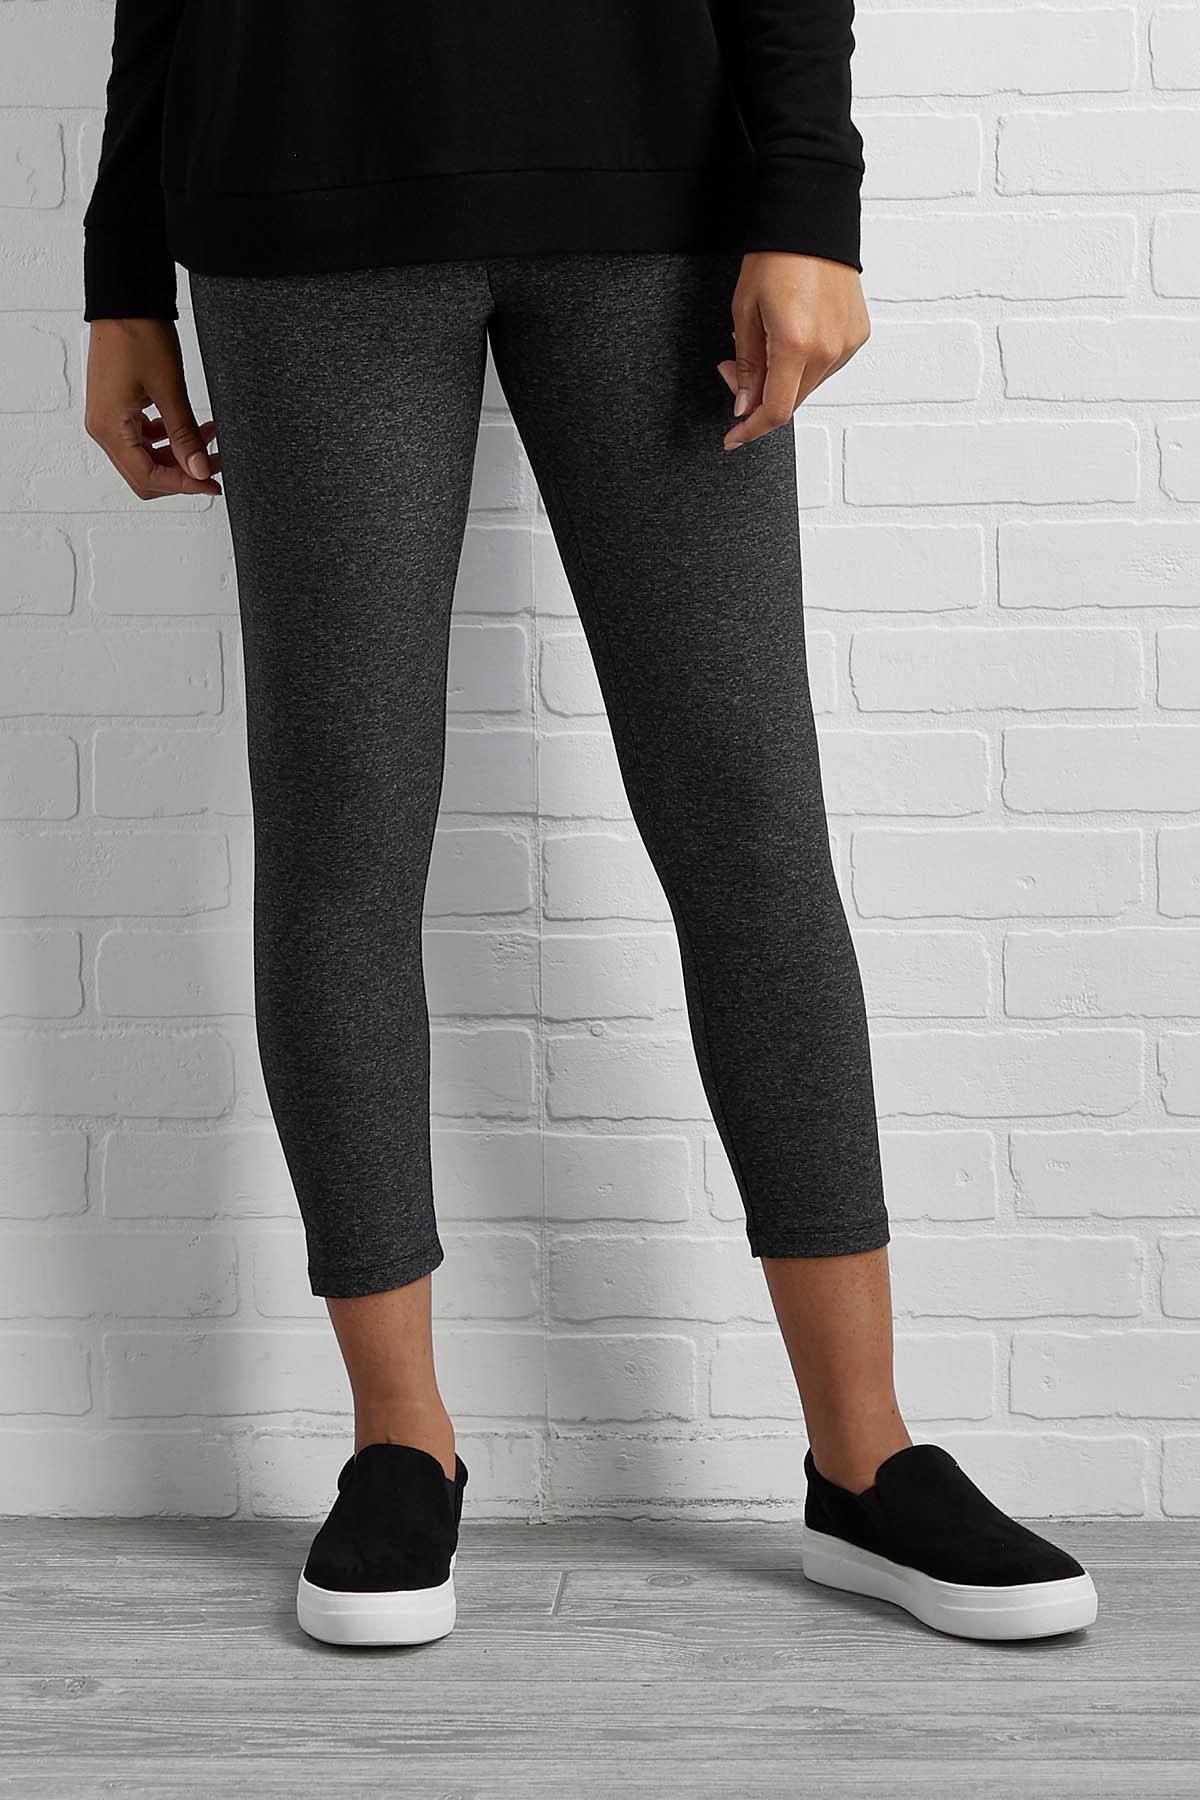 Heathered Ponte Cropped Leggings